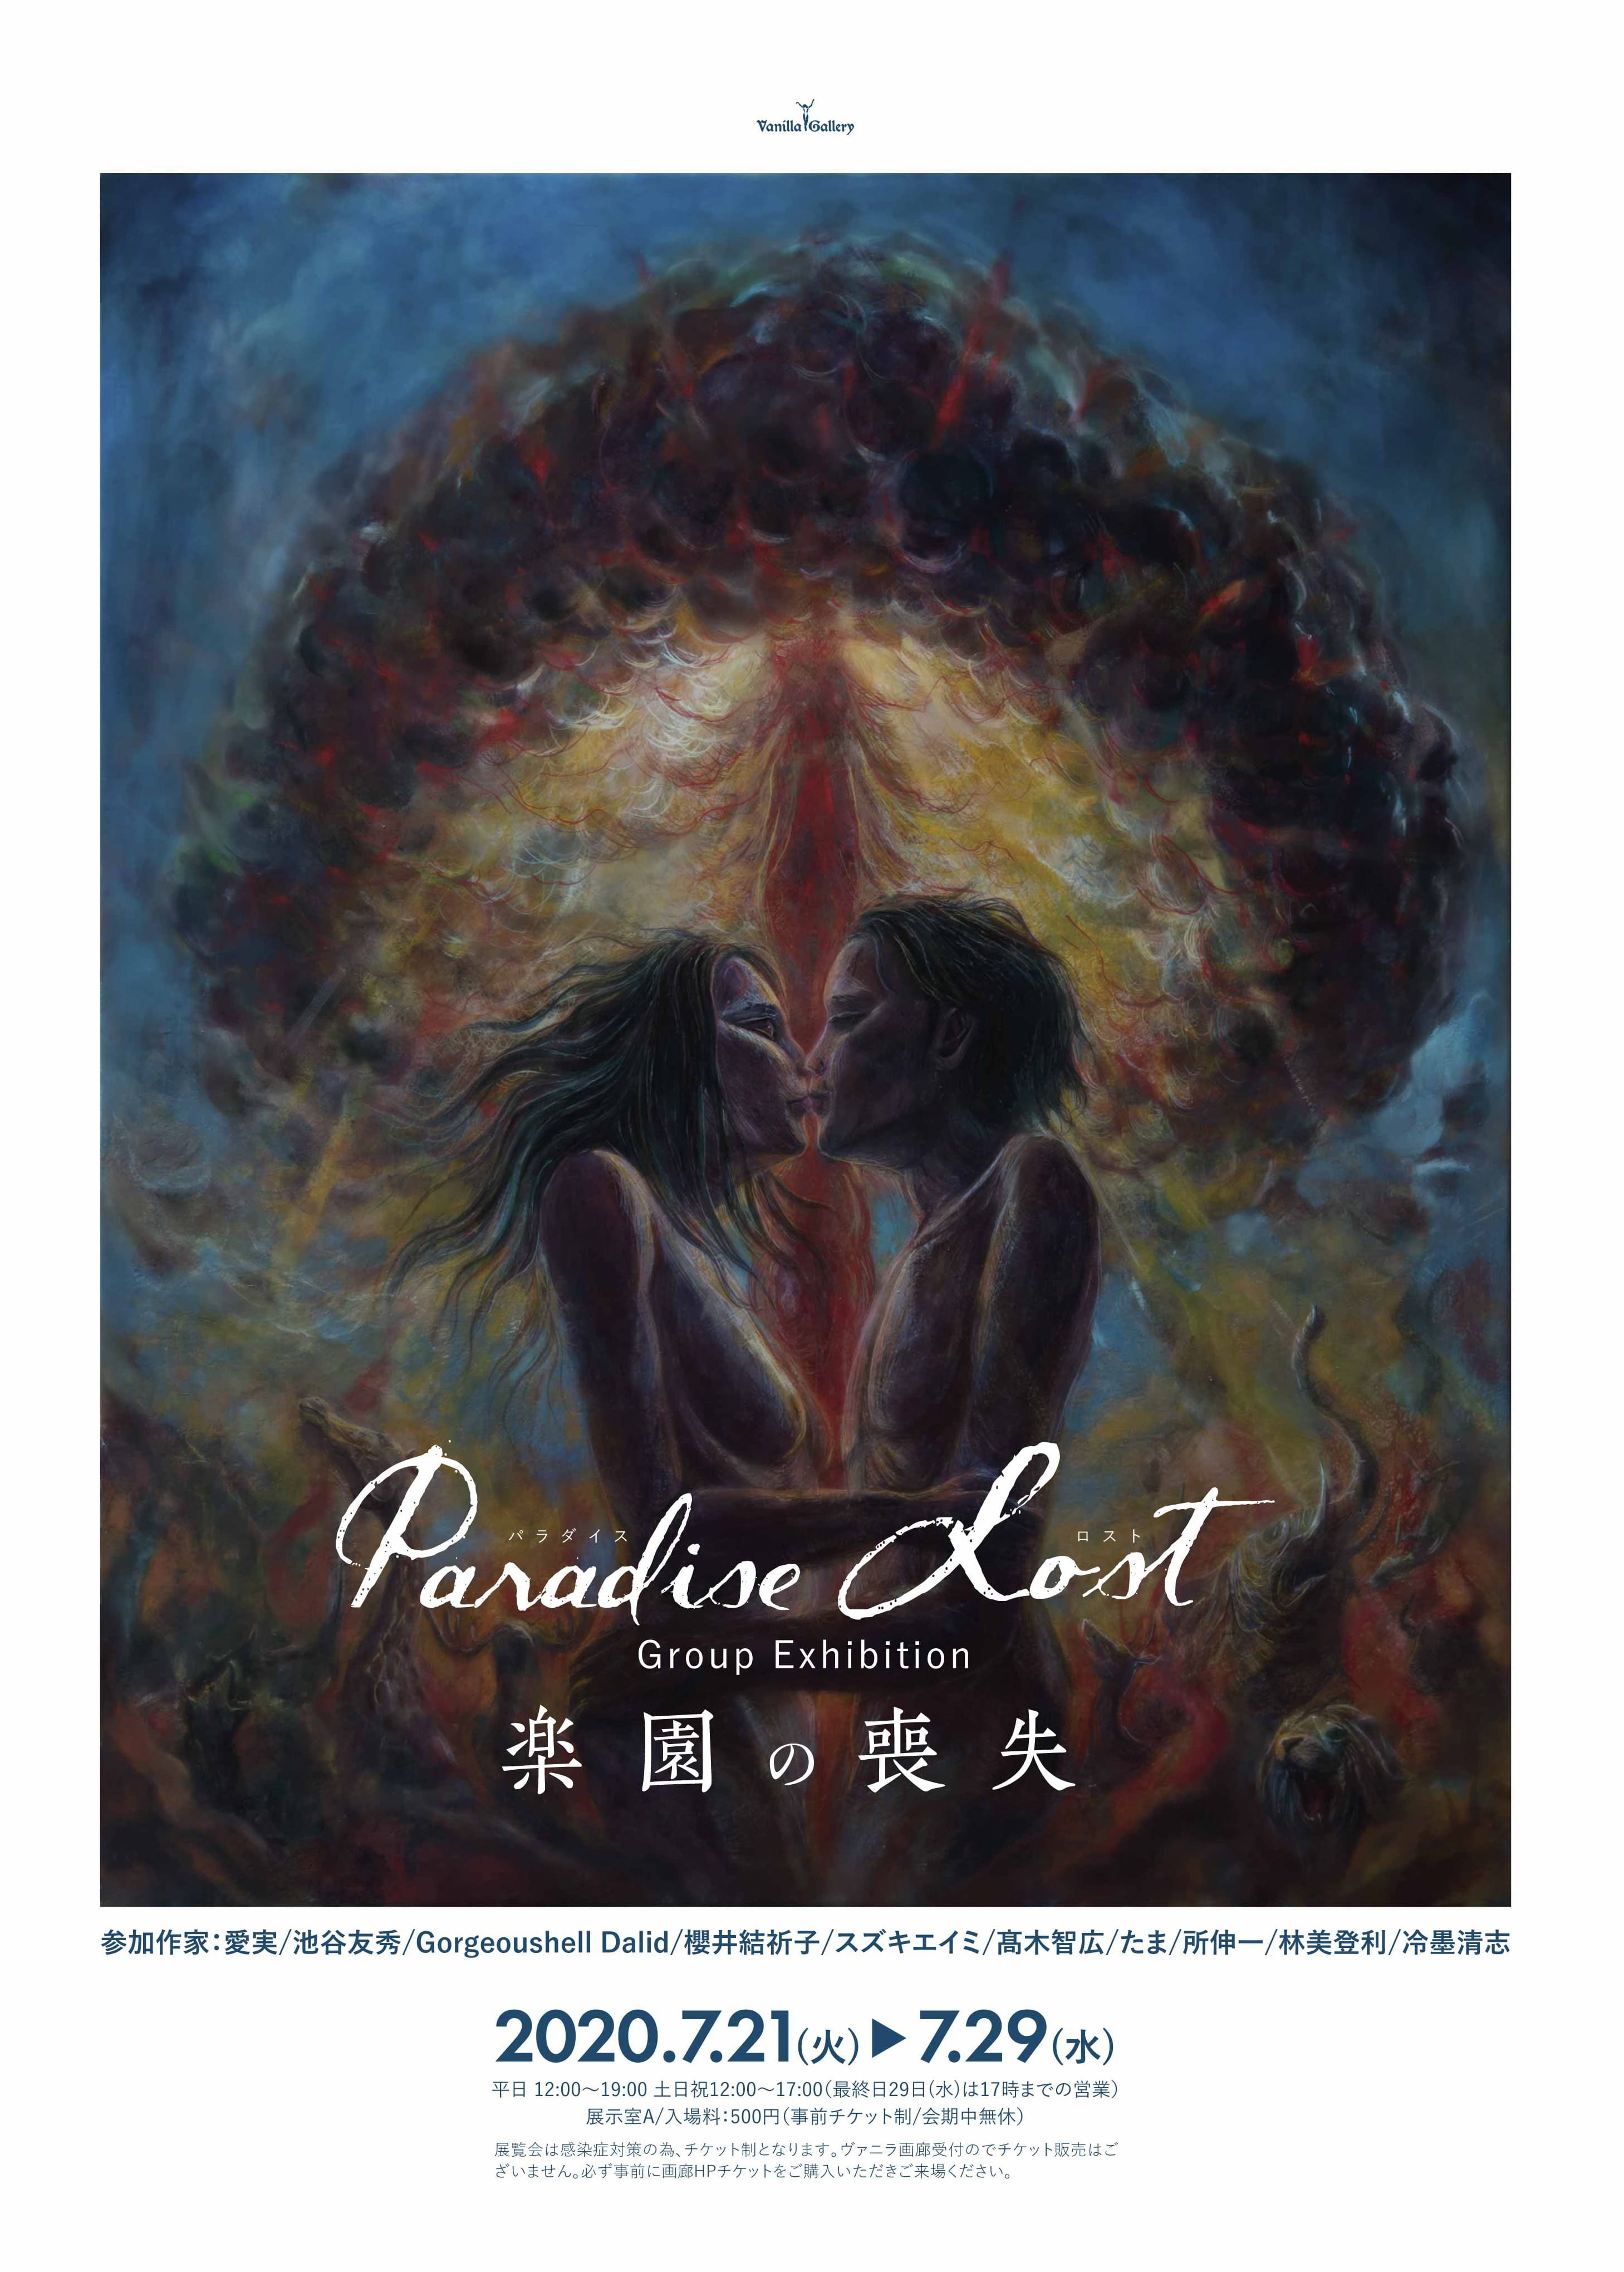 「Paradise Lost ~楽園の喪失~」グループ展 7月28日チケット